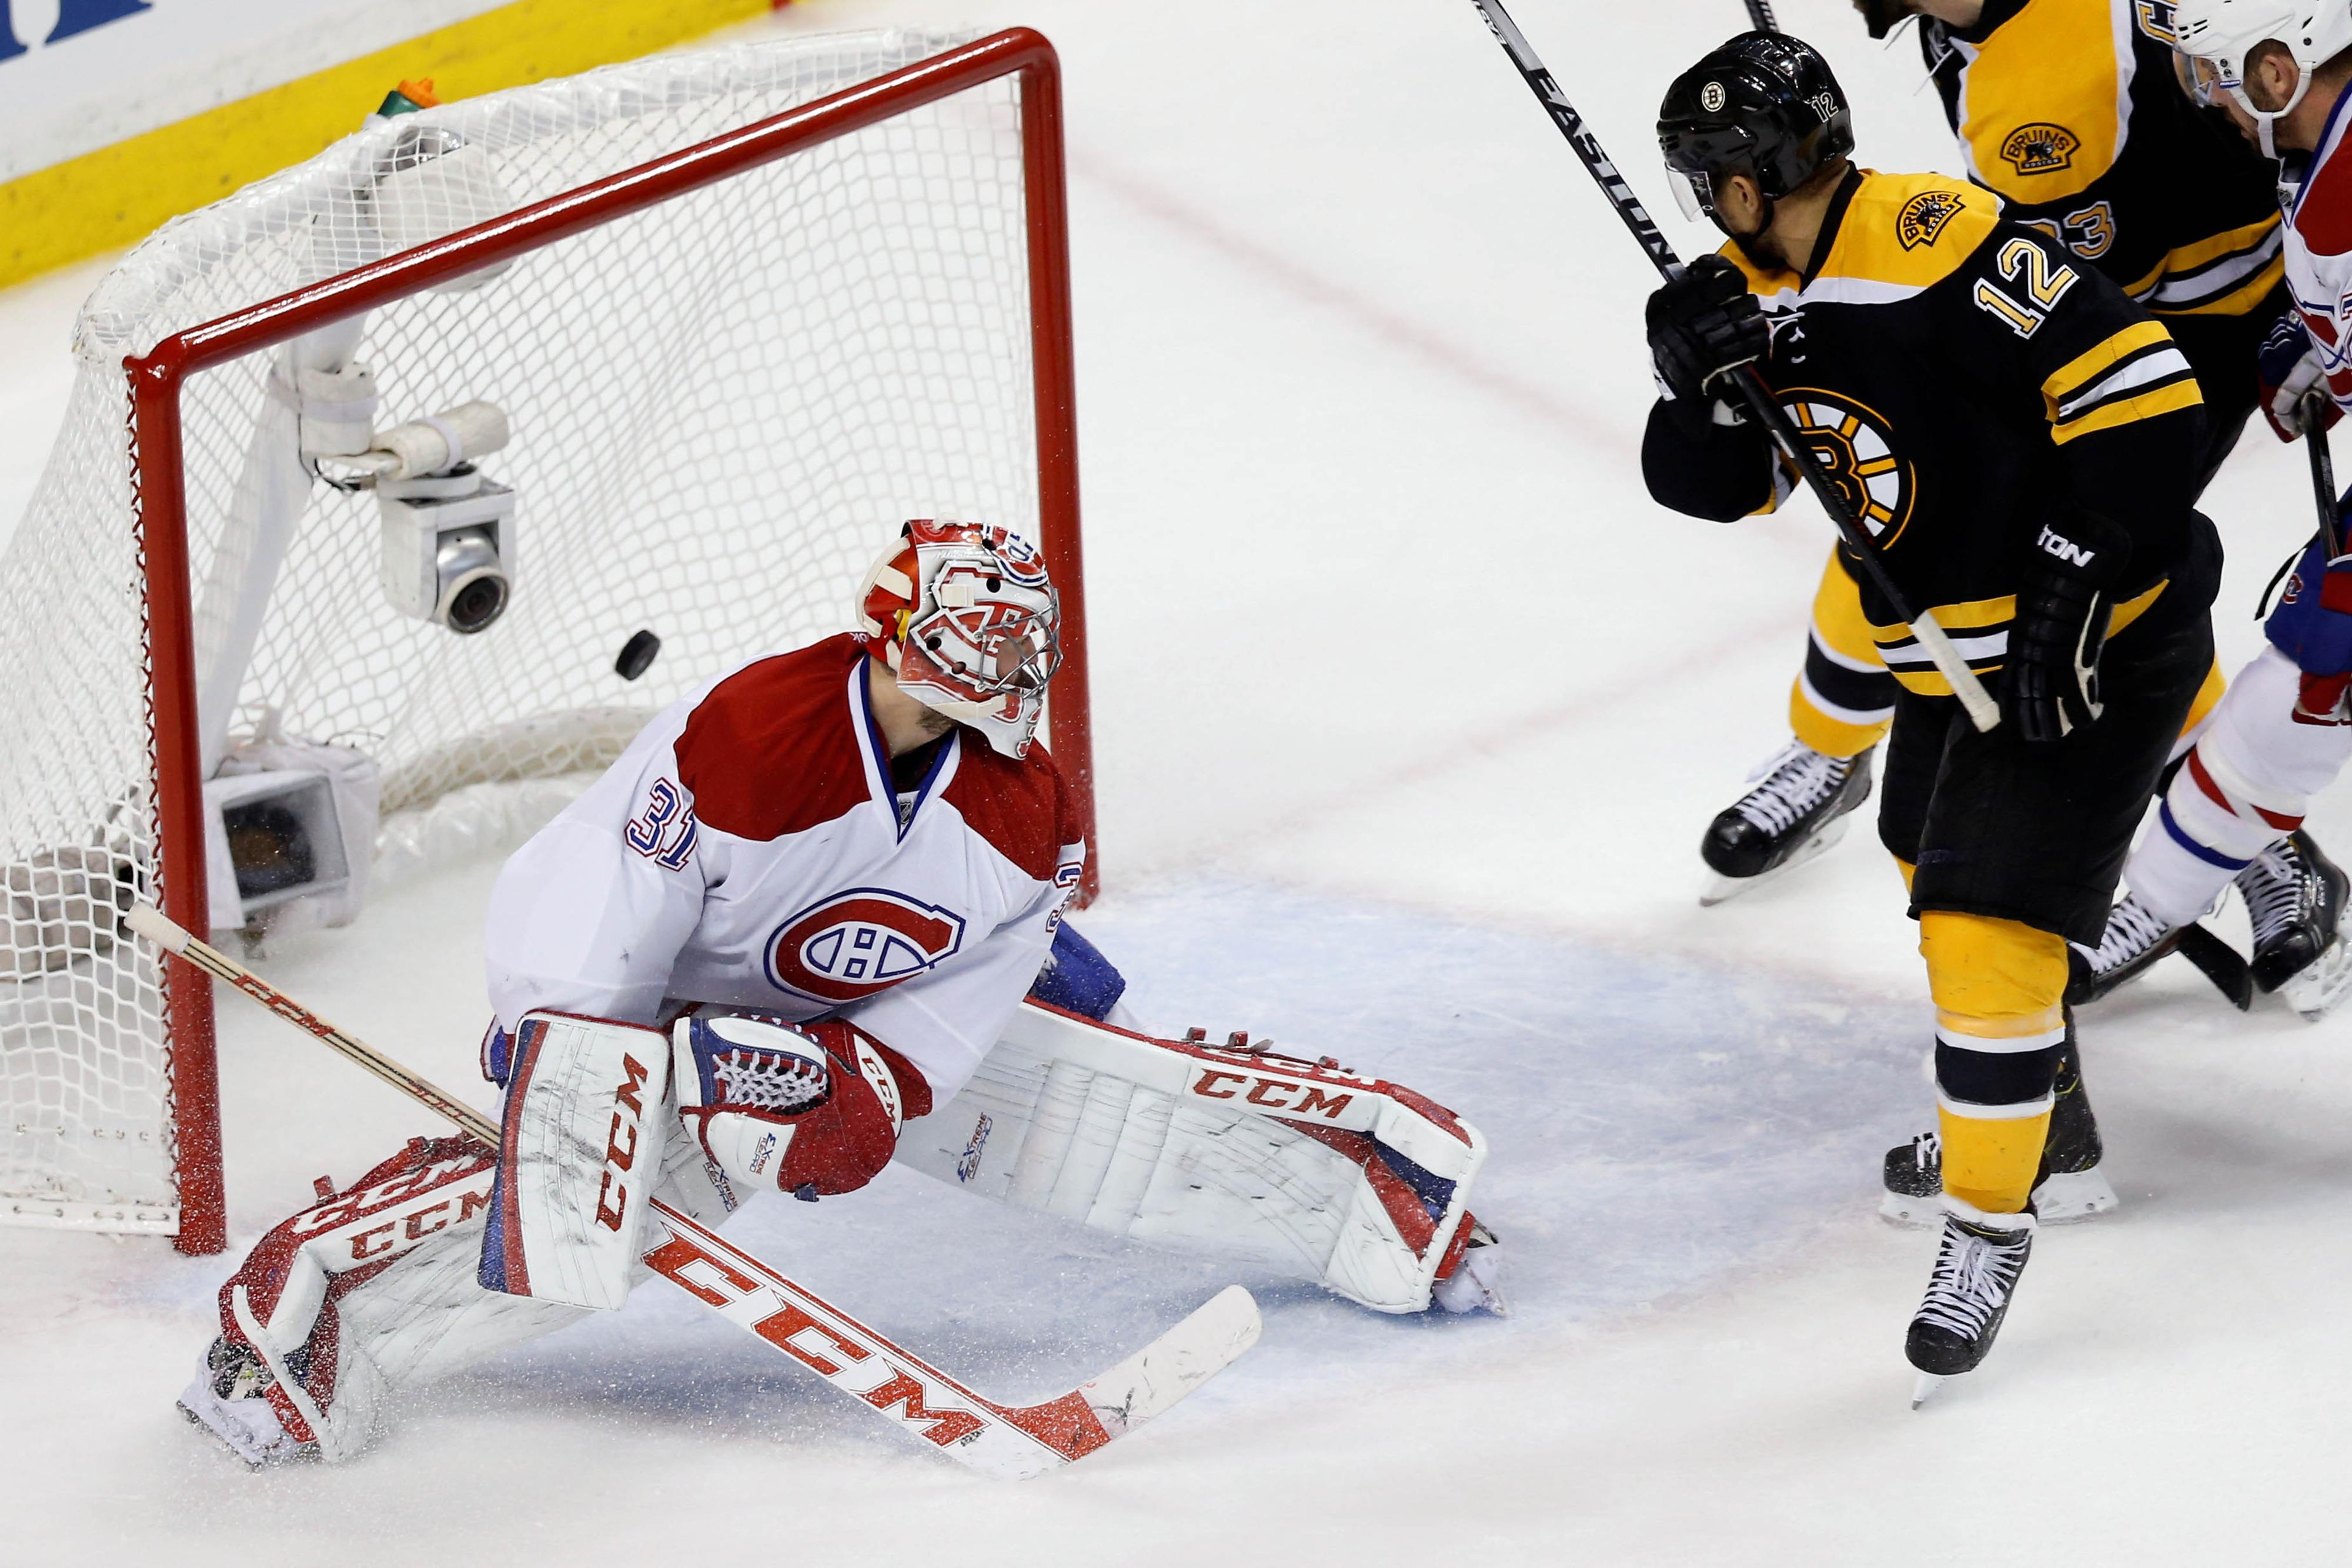 Iginla scoring the last goal of the Bruins' season.